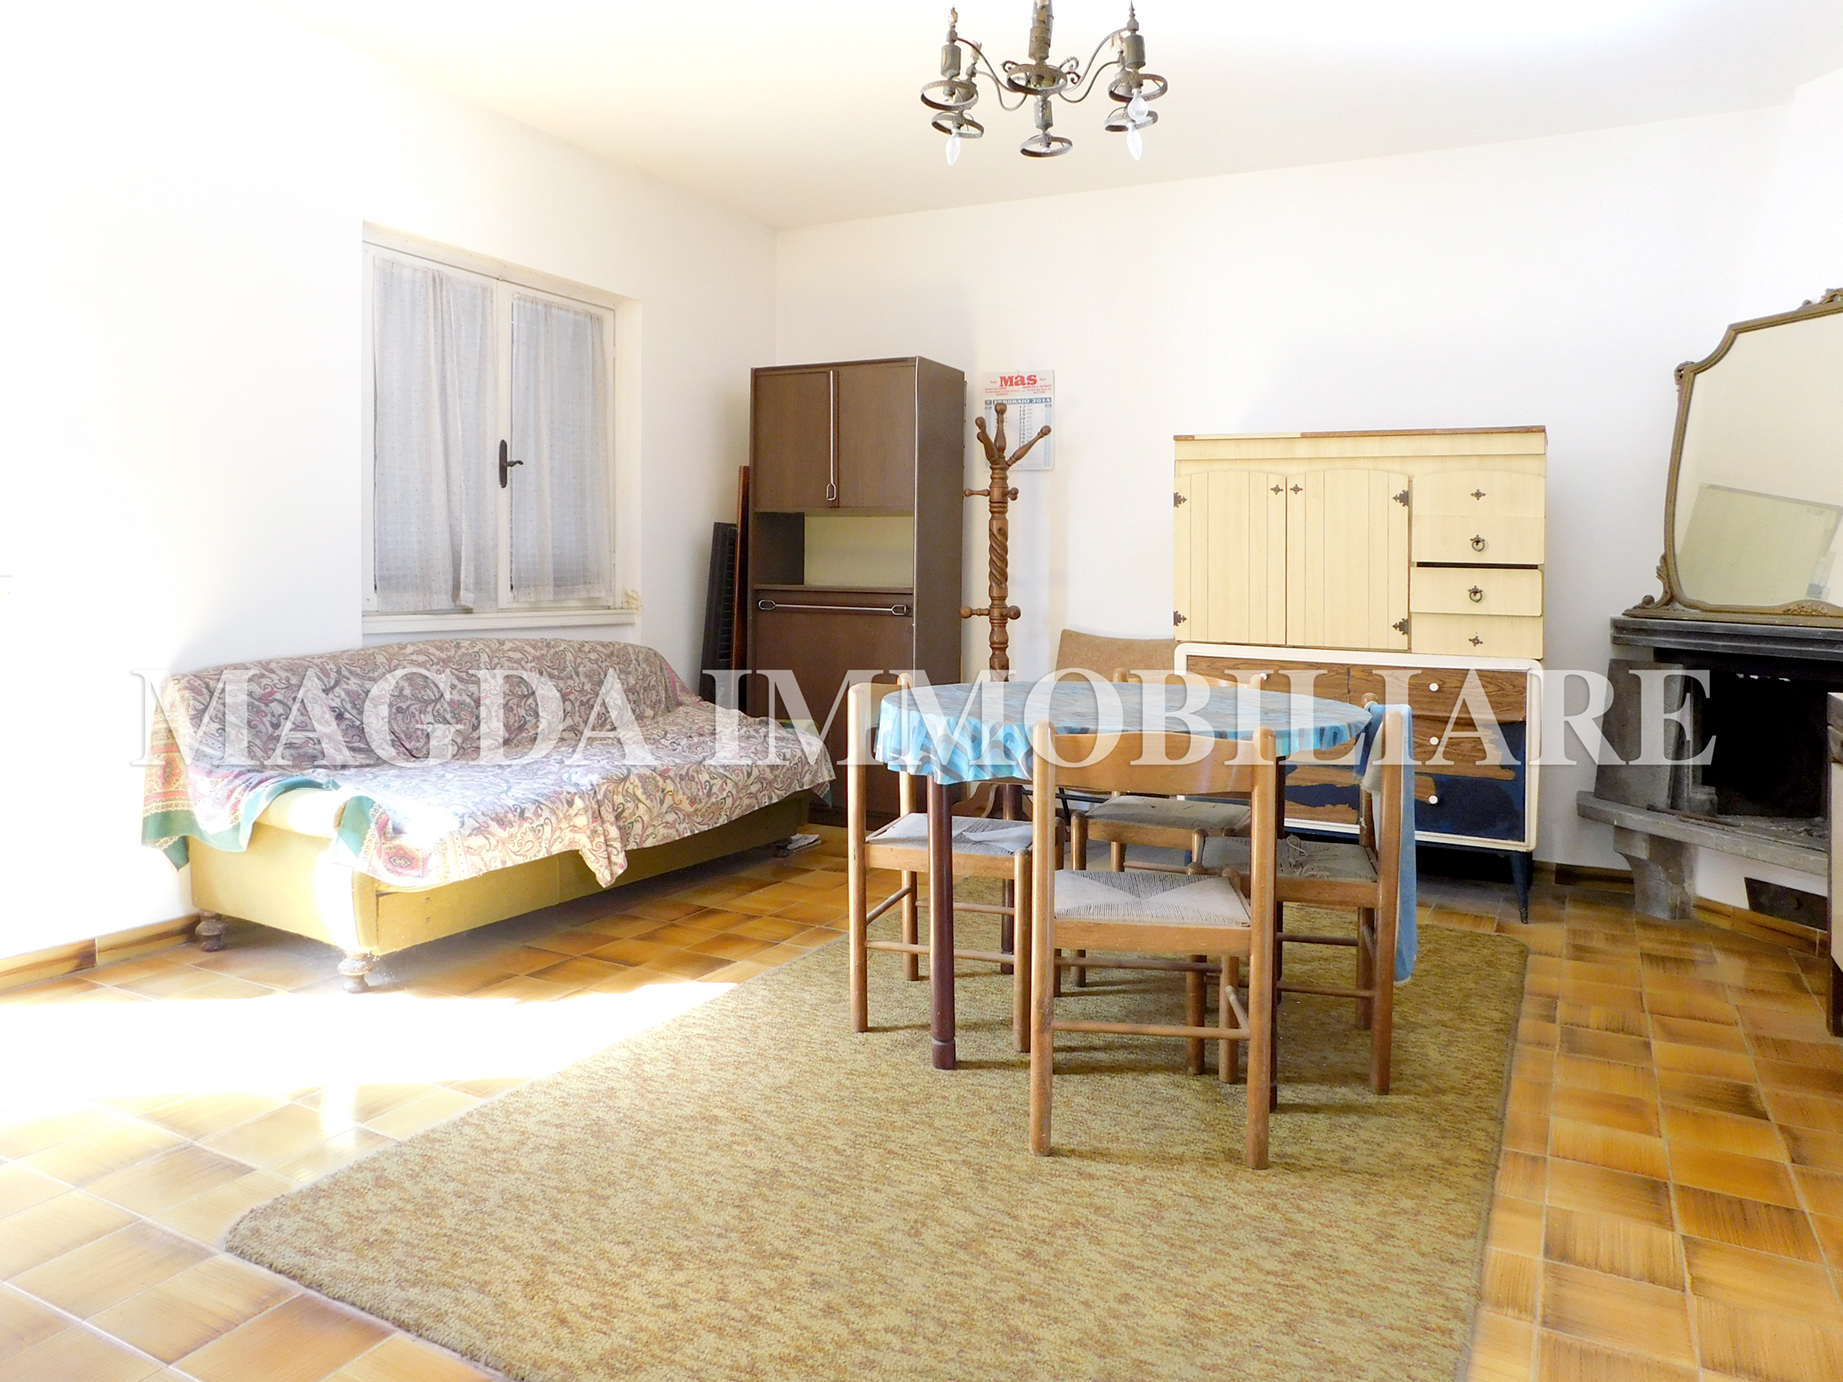 Appartamento a Cerenova - Via Sillaro, 4